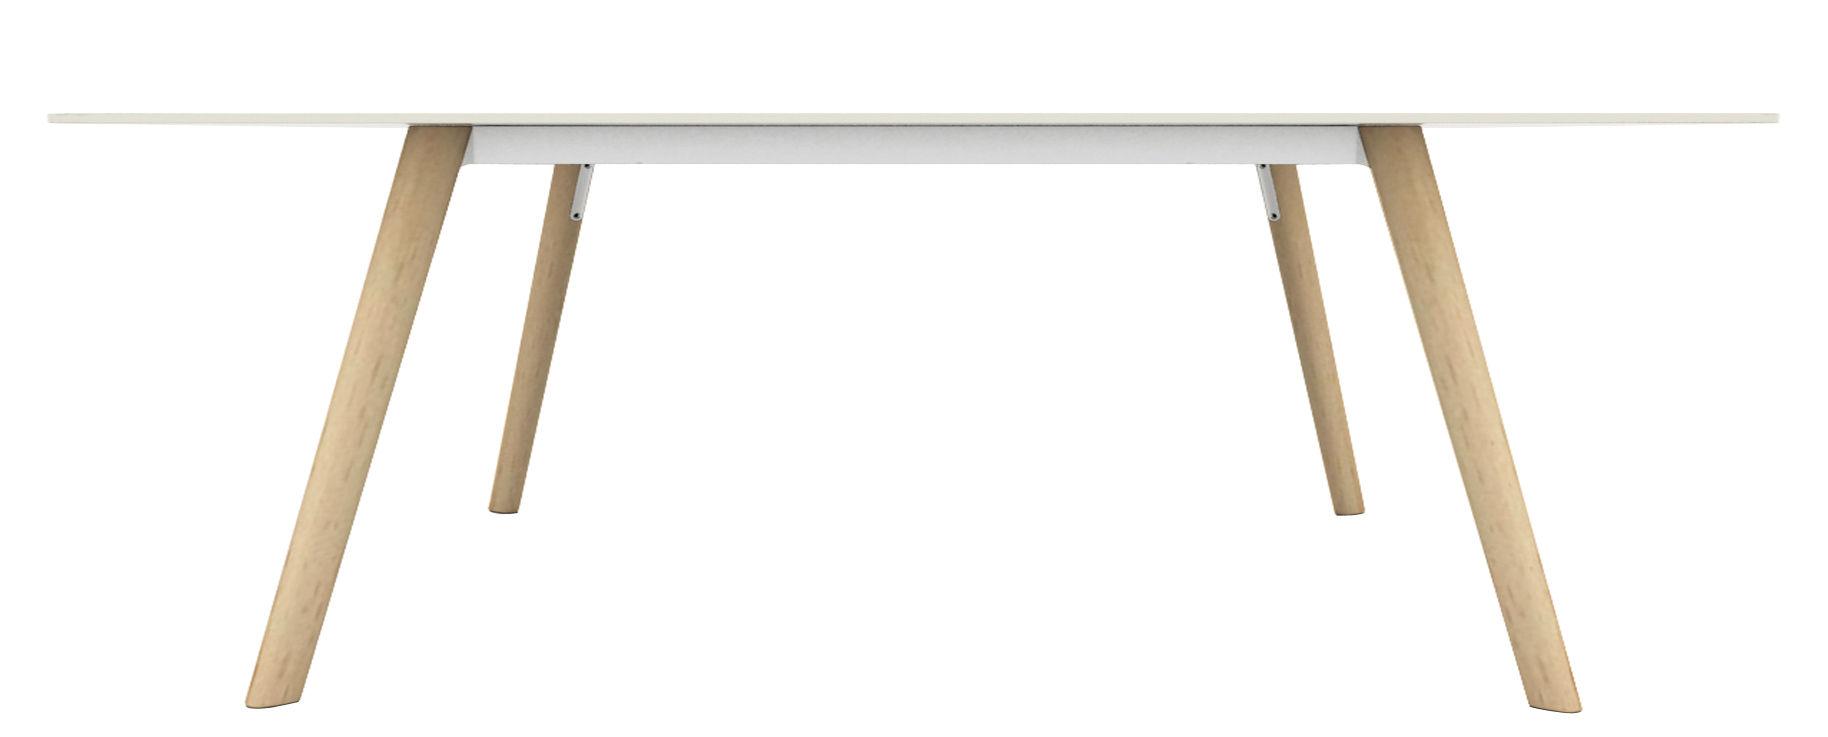 Furniture - Dining Tables - Pilo Rectangular table by Magis - Natural wood / white - Ashwood, Cast aluminium, HPL